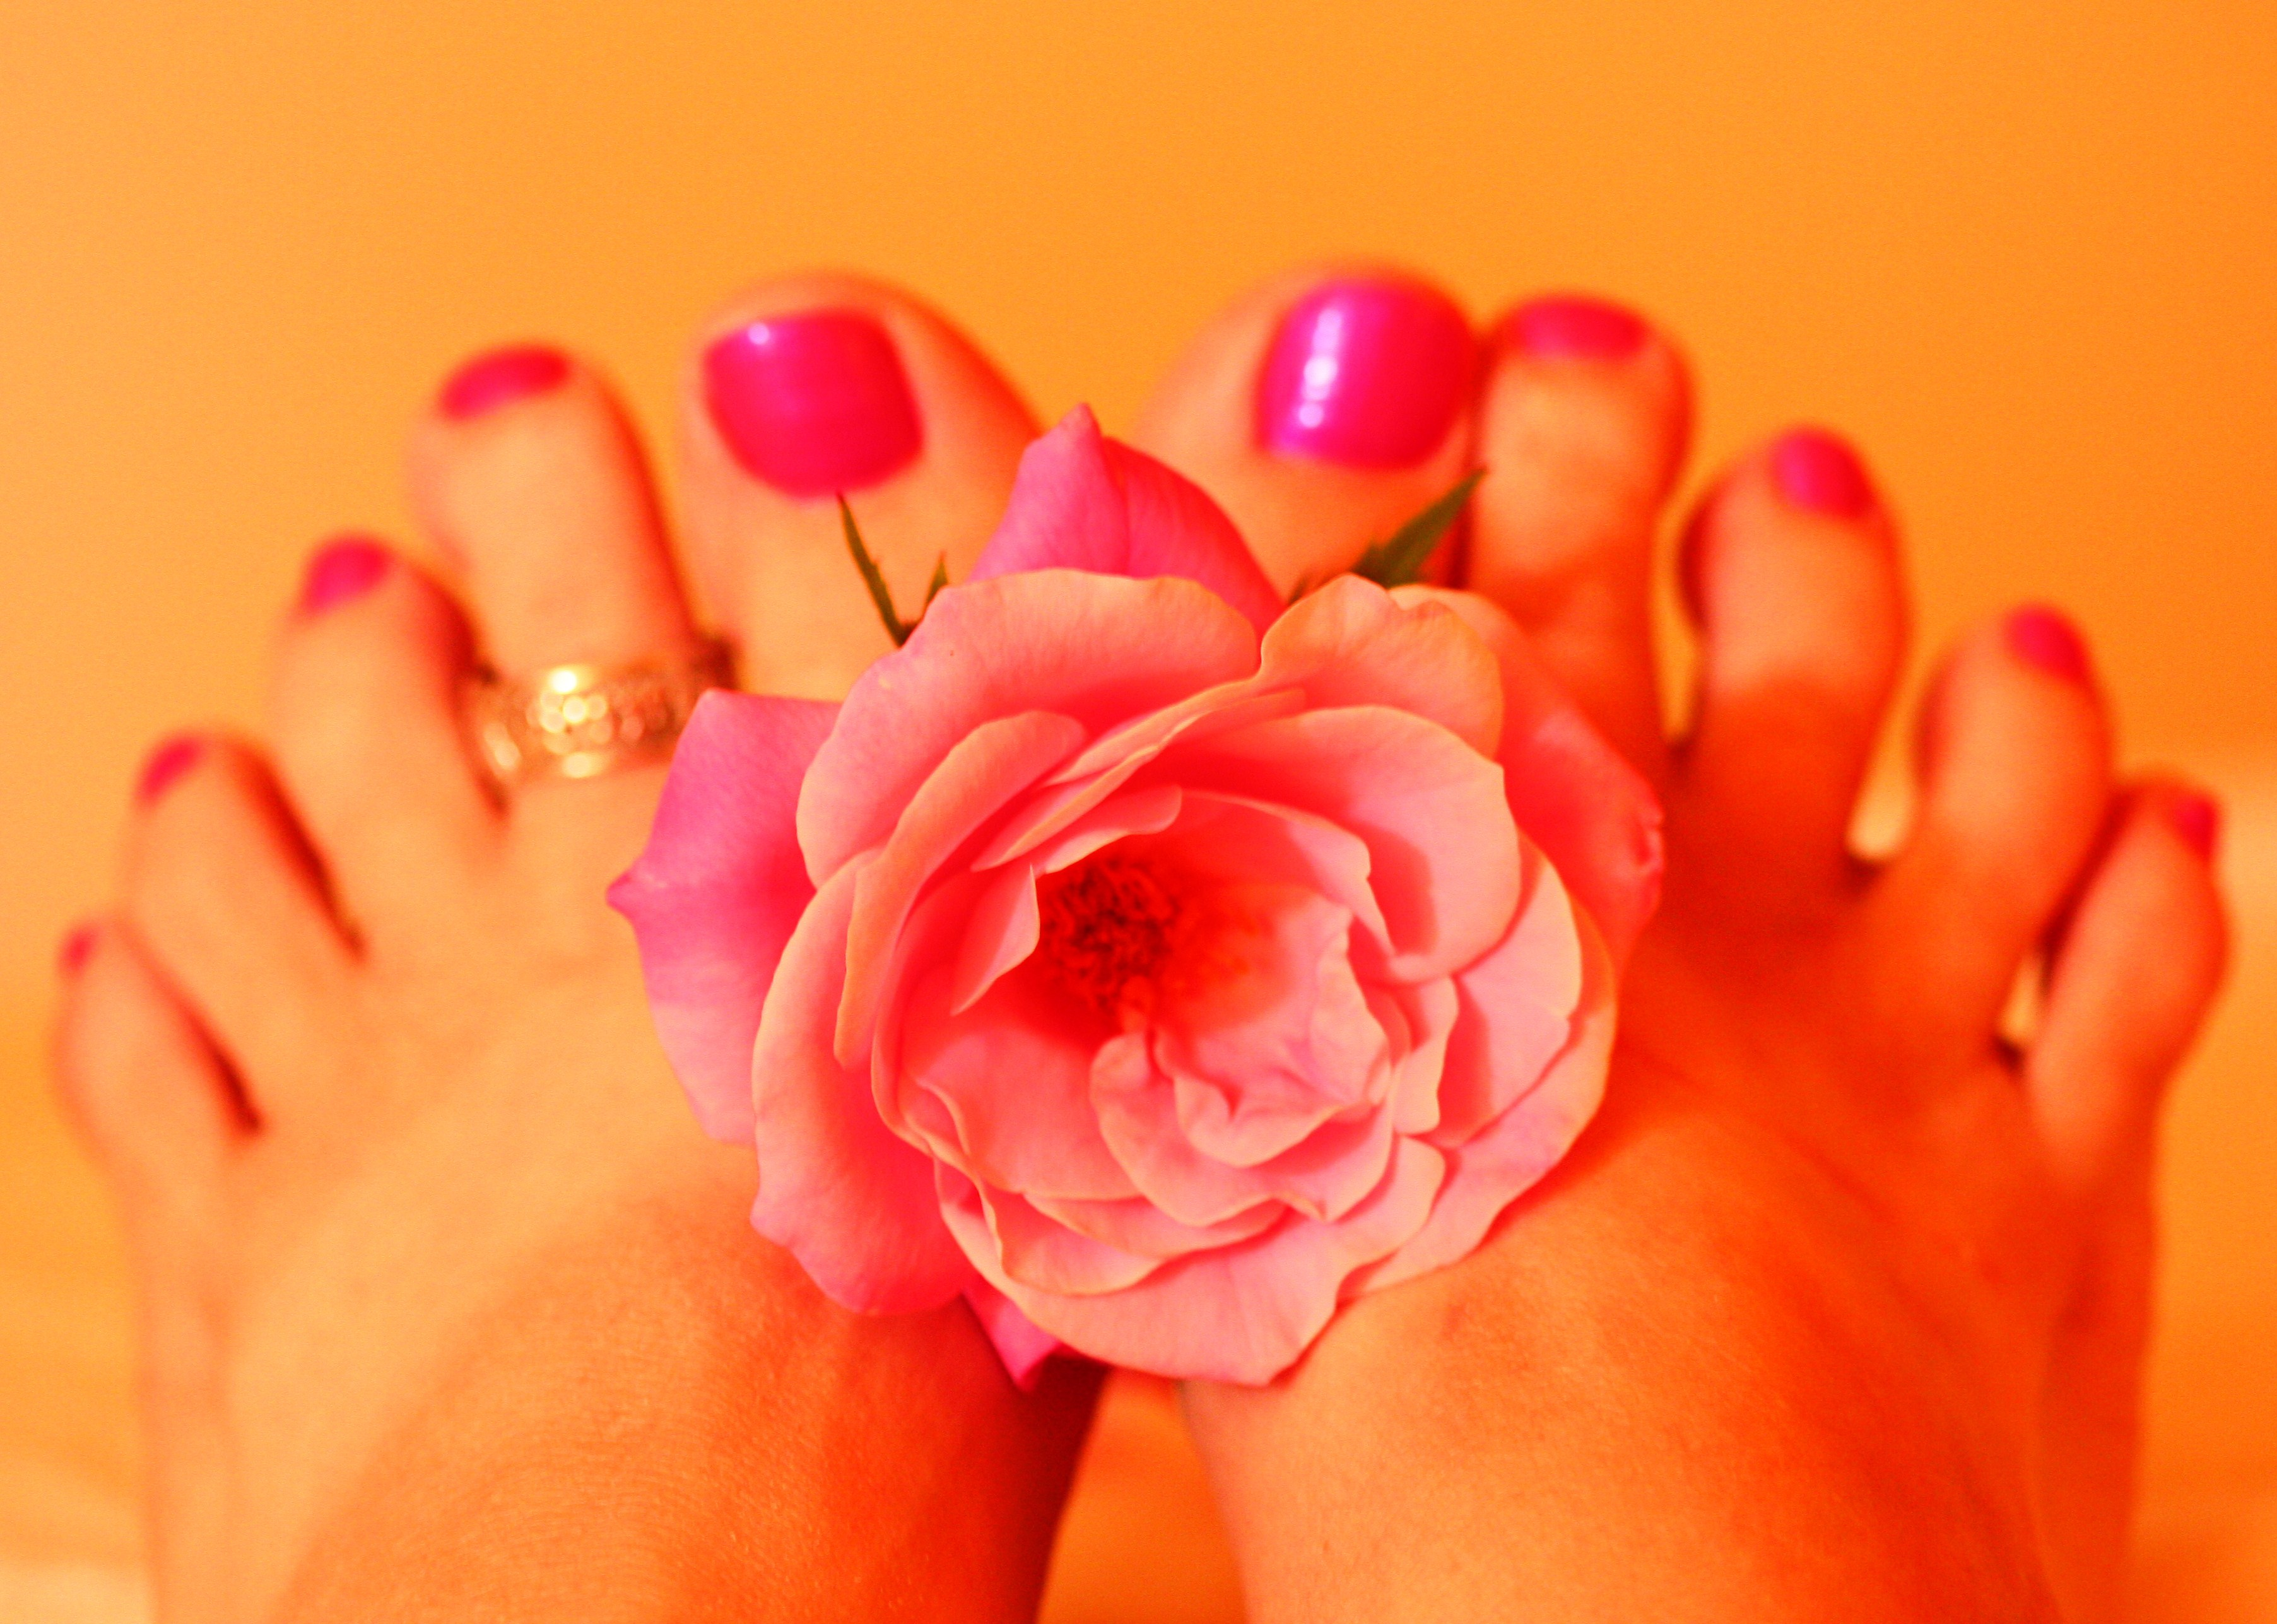 File:Woman's Feet Holding Pink Rose Fresh Pedicure.jpg